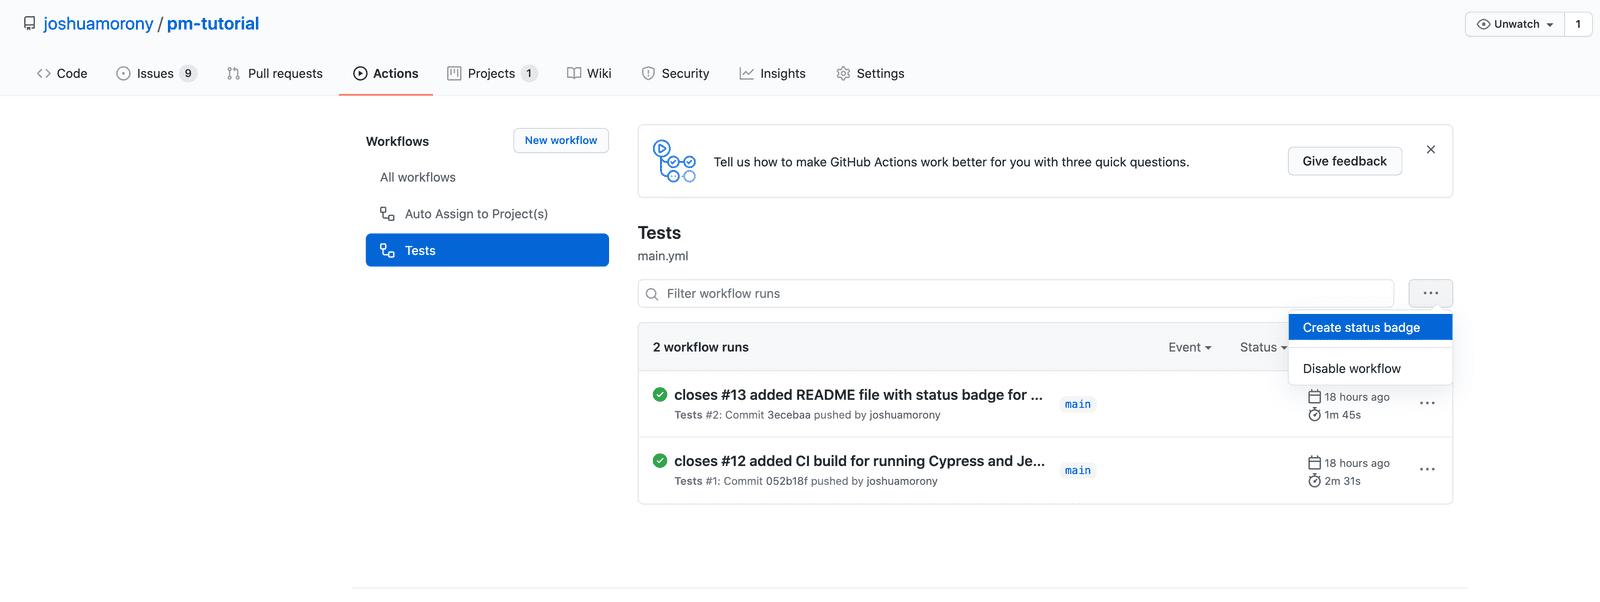 Creating a status badge